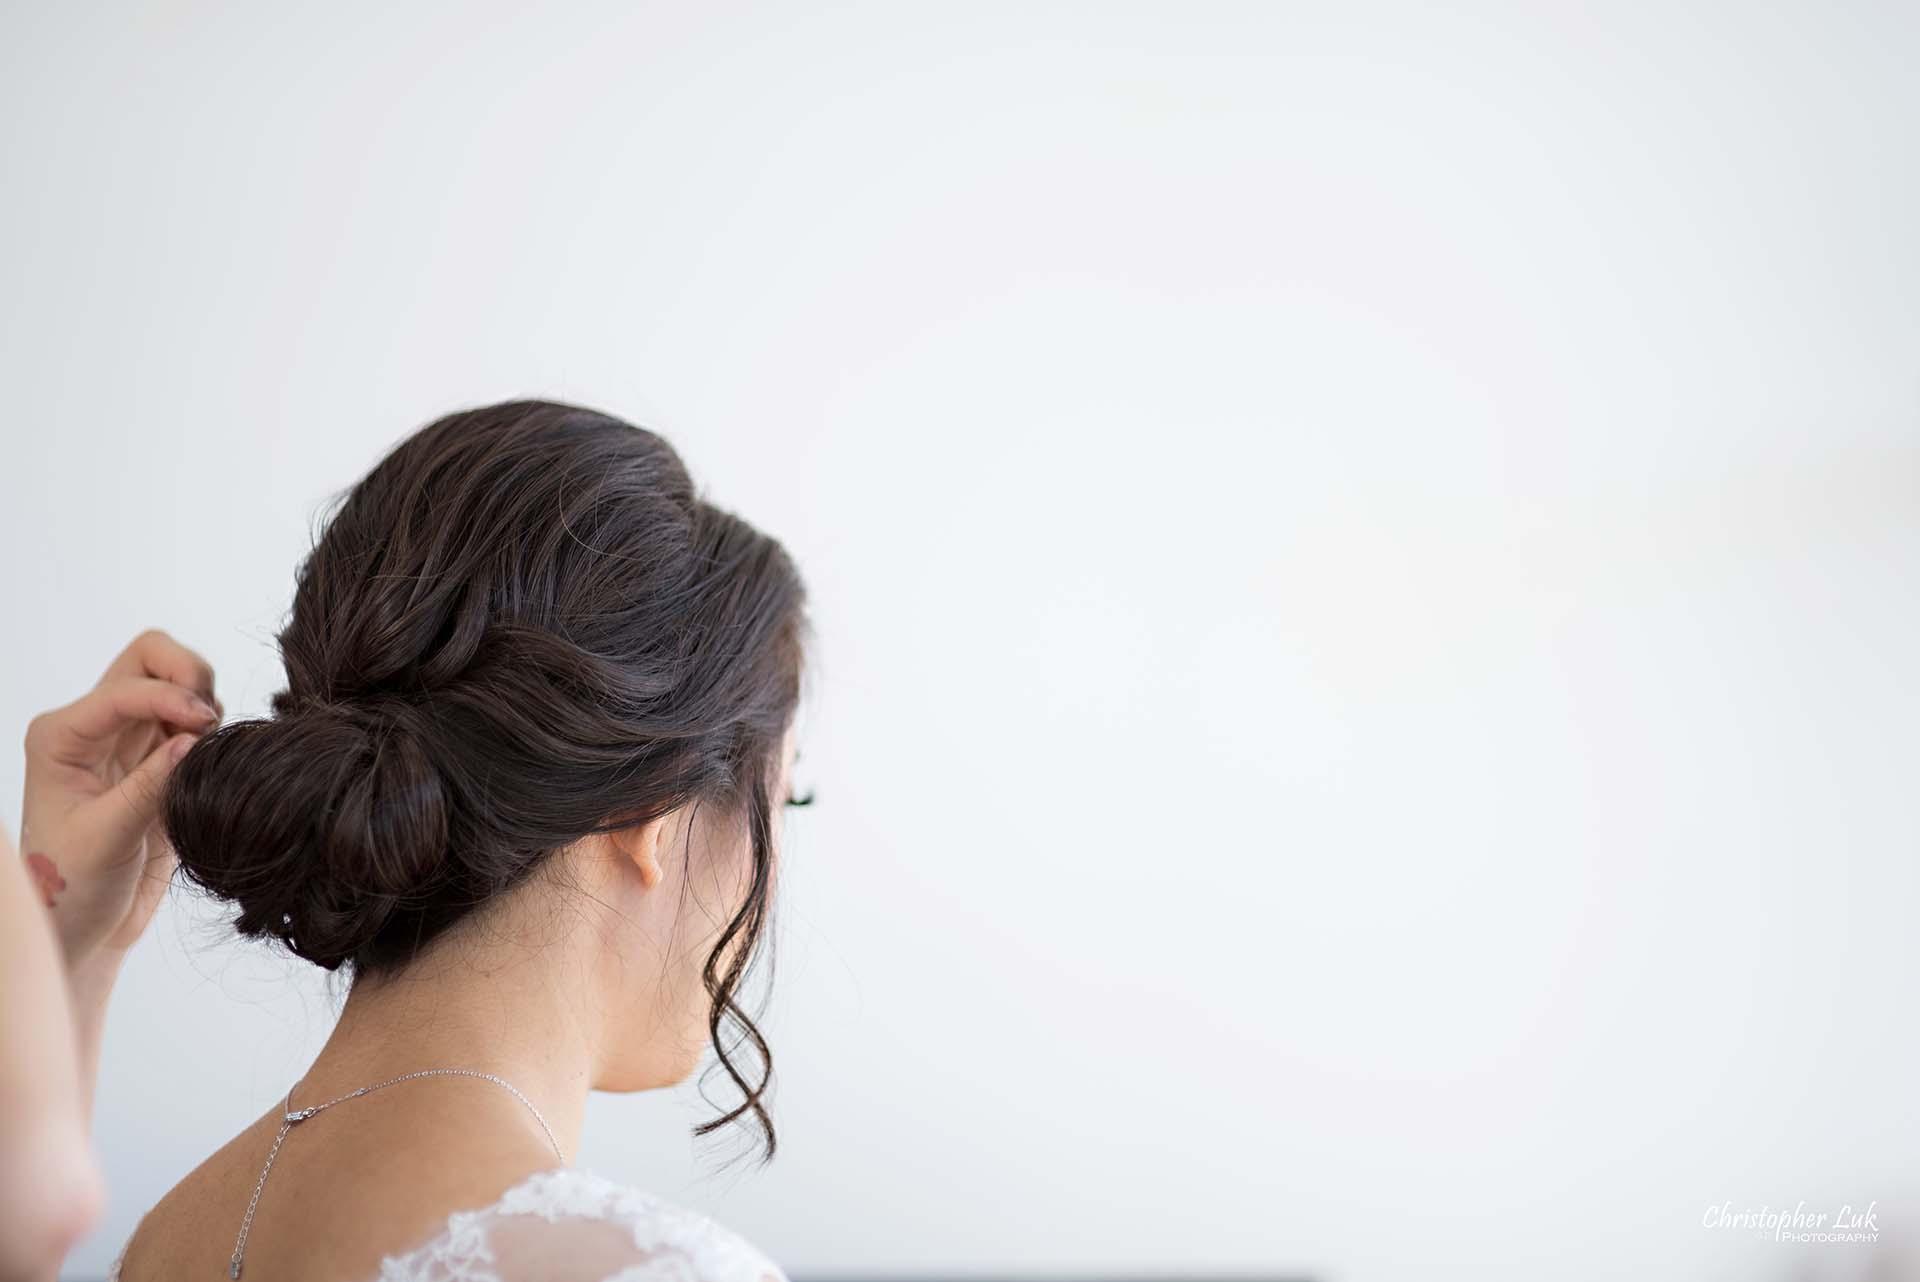 Christopher Luk Toronto Wedding Photographer - Natural Candid Photojournalistic Bride Makeup Artist Hair Stylist Crystal Lam Elle Beauty crystalellebeauty